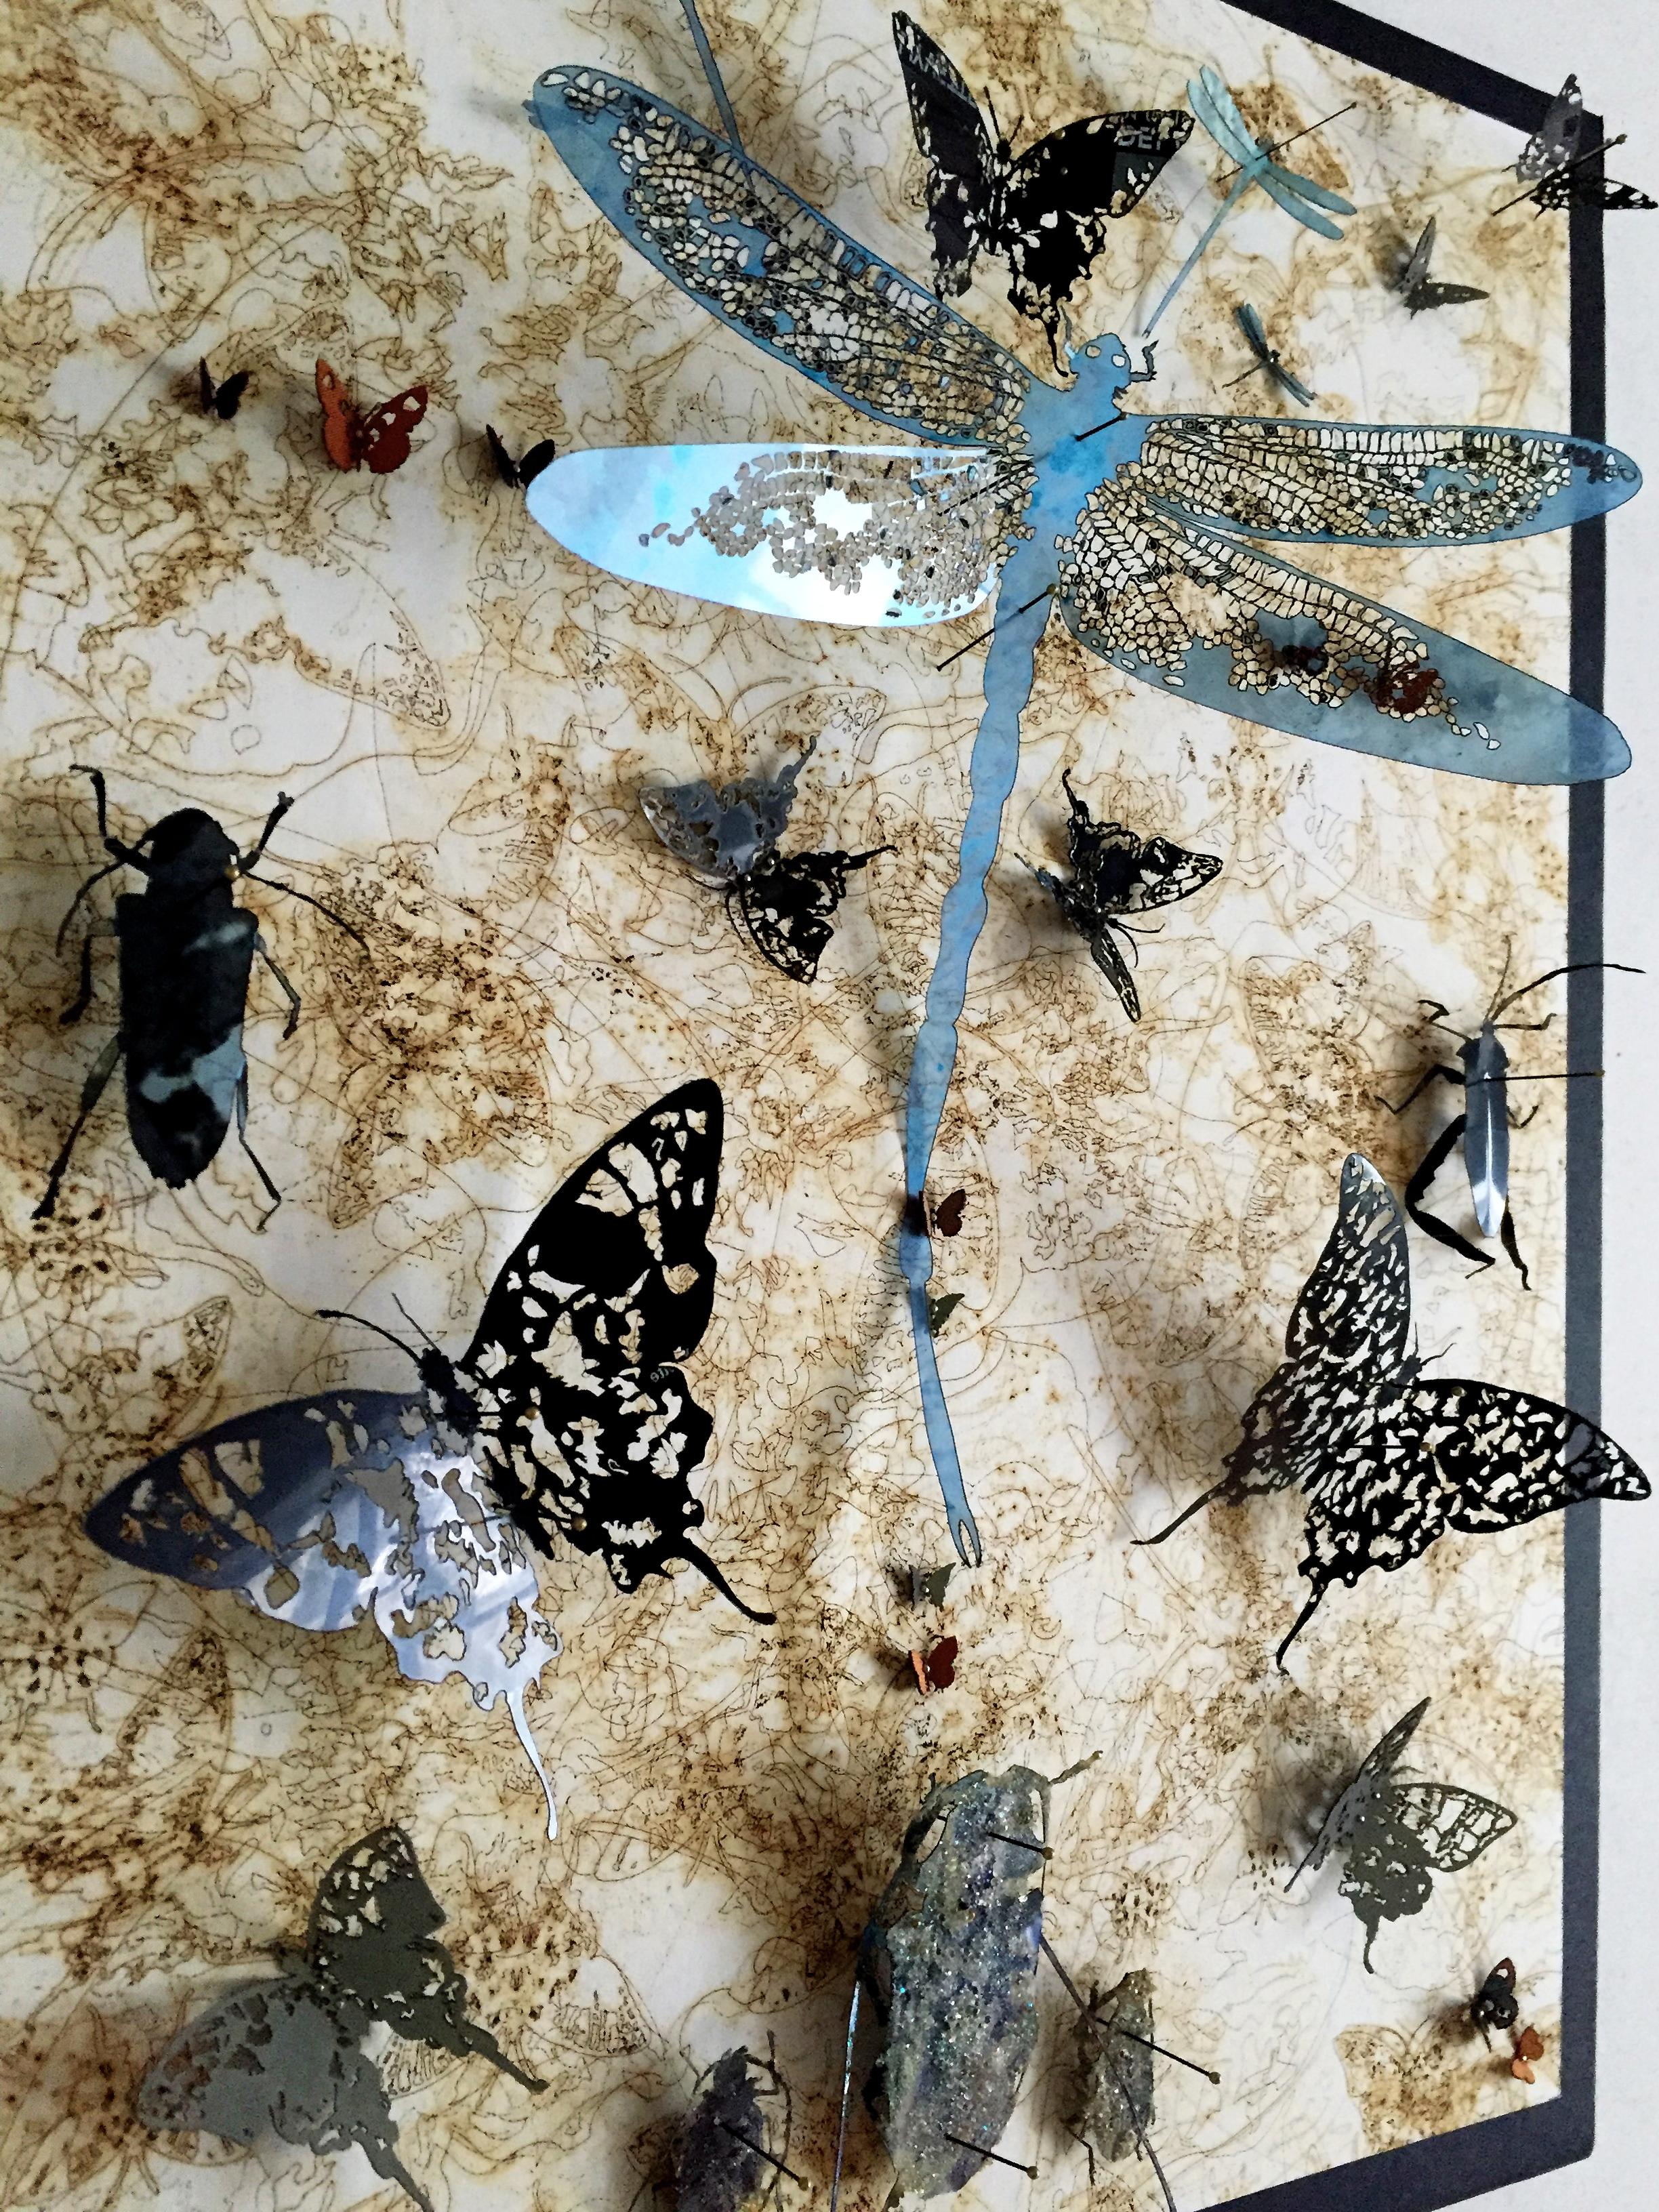 Amarger_artiste_2018_entomologiste-865-tableaux-detail-libellule.